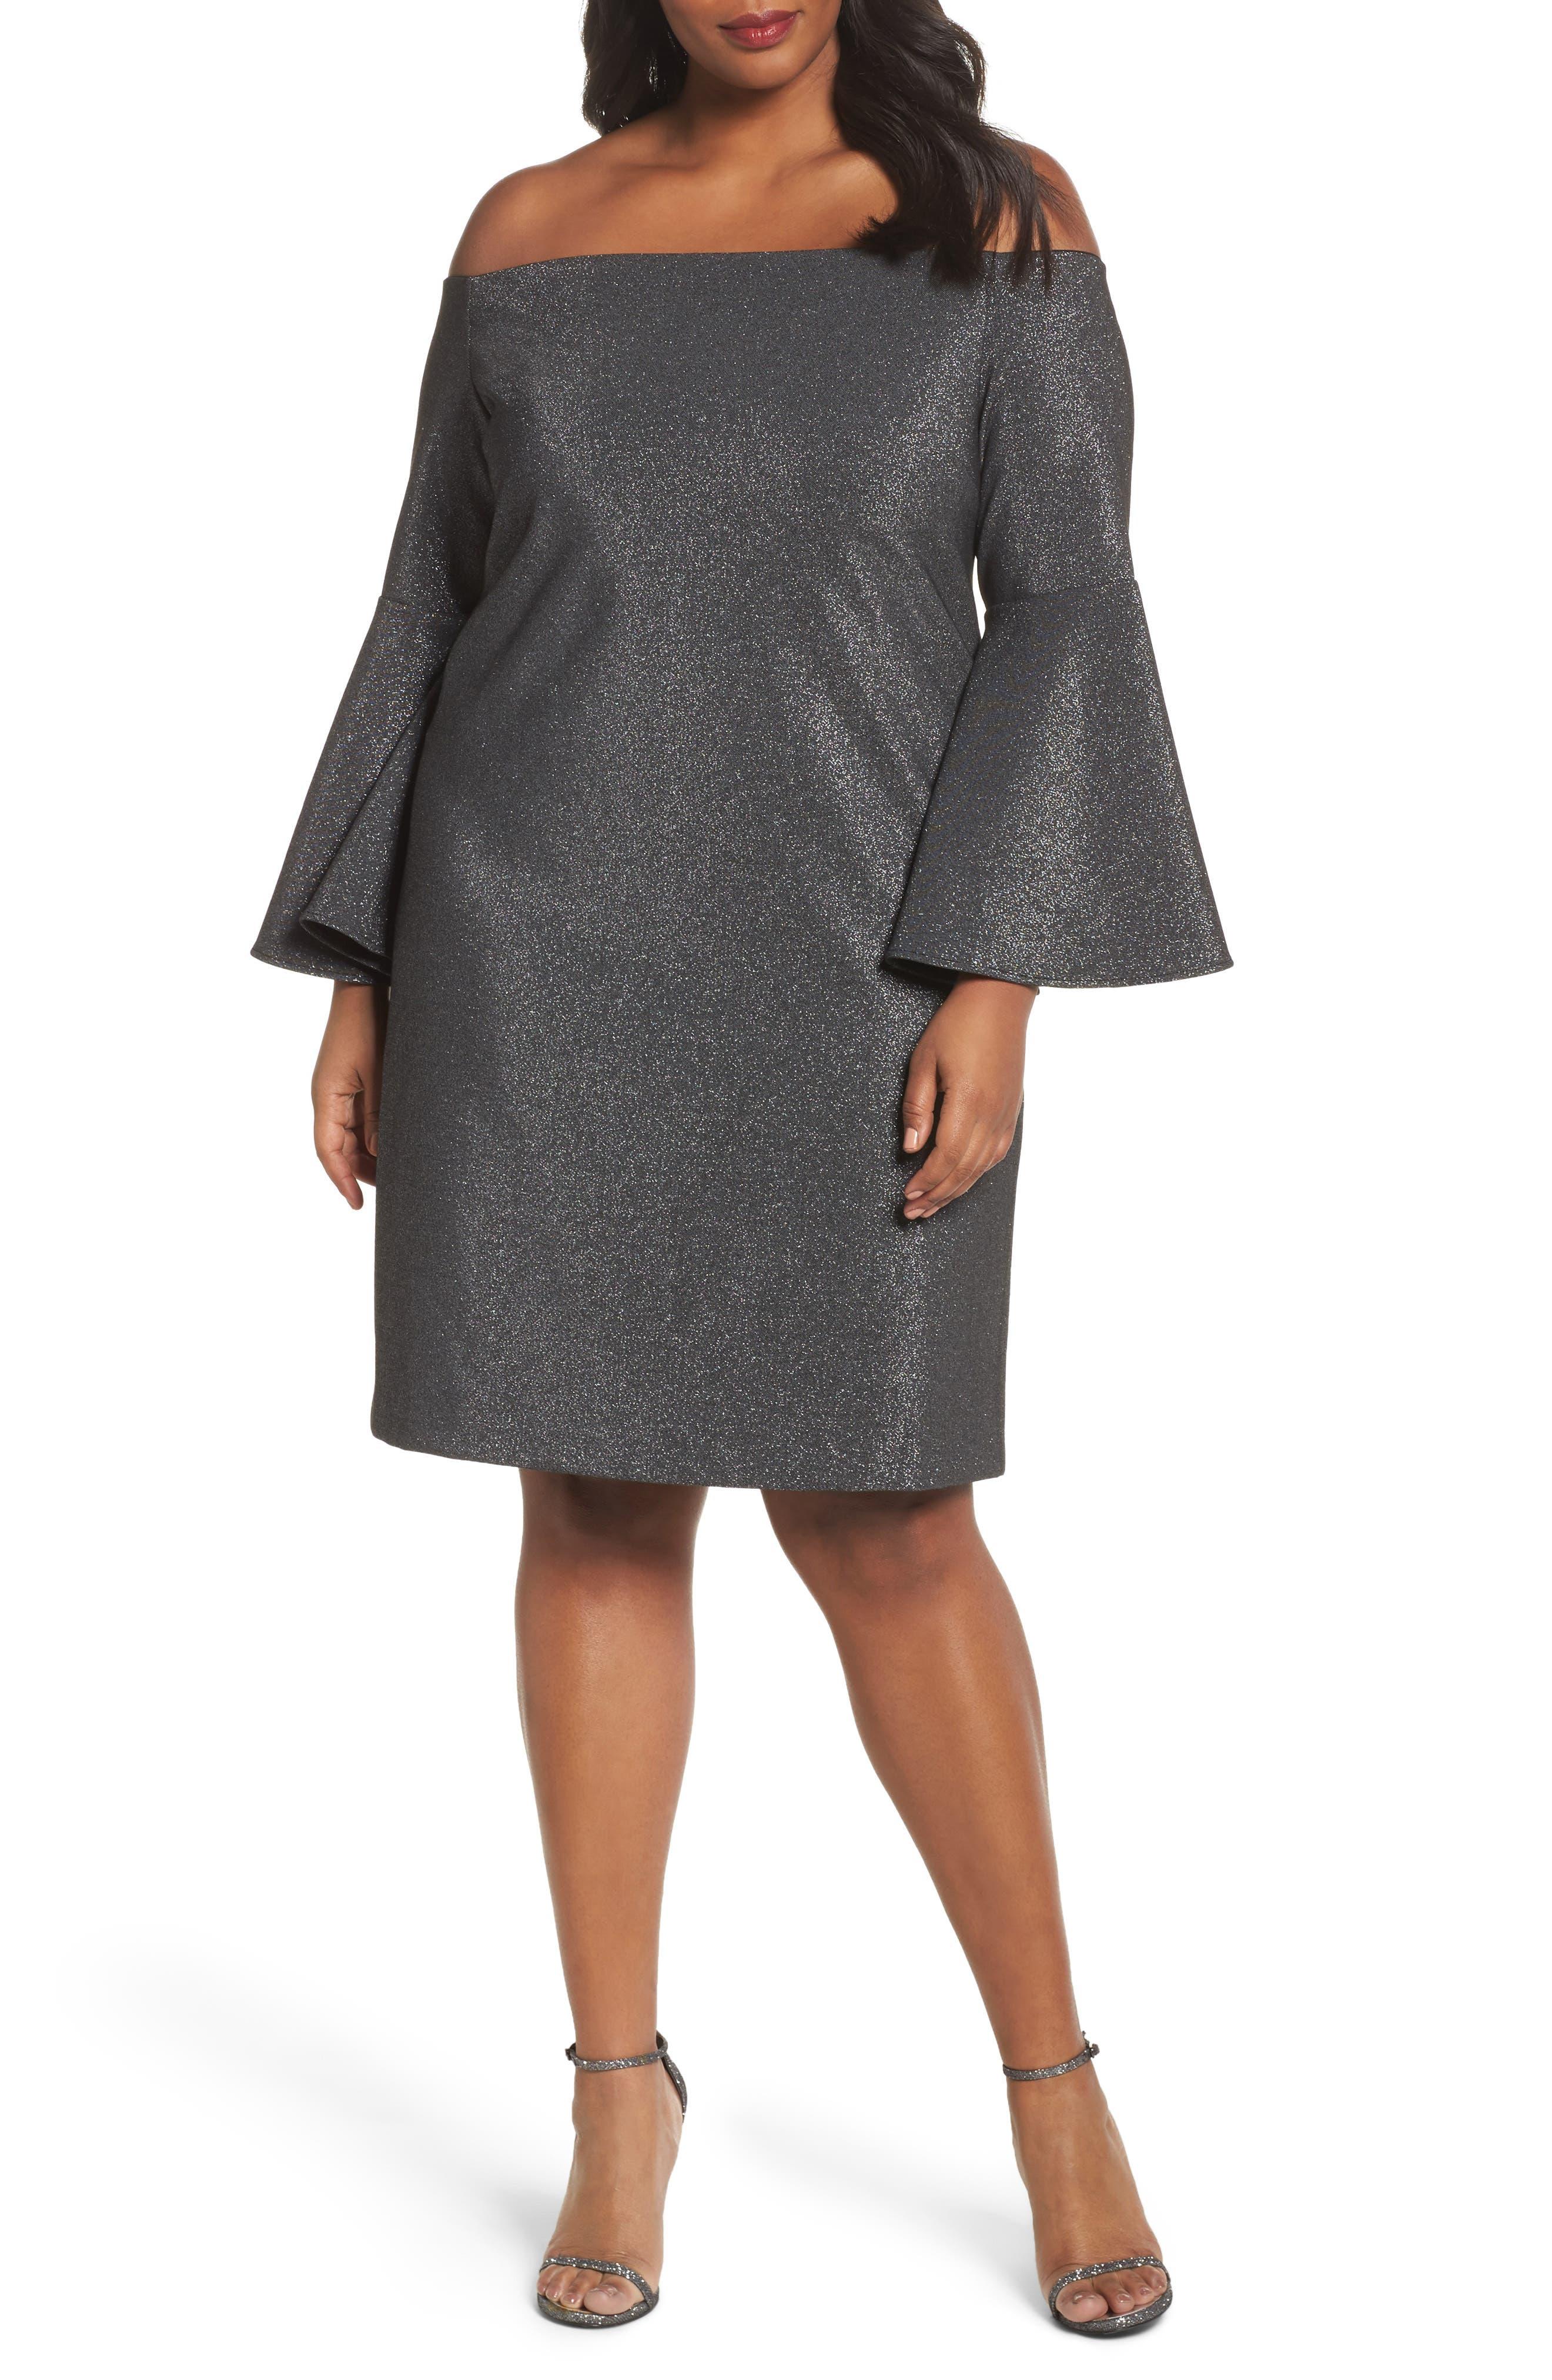 Off the Shoulder Metallic Sheath Dress,                             Main thumbnail 1, color,                             006